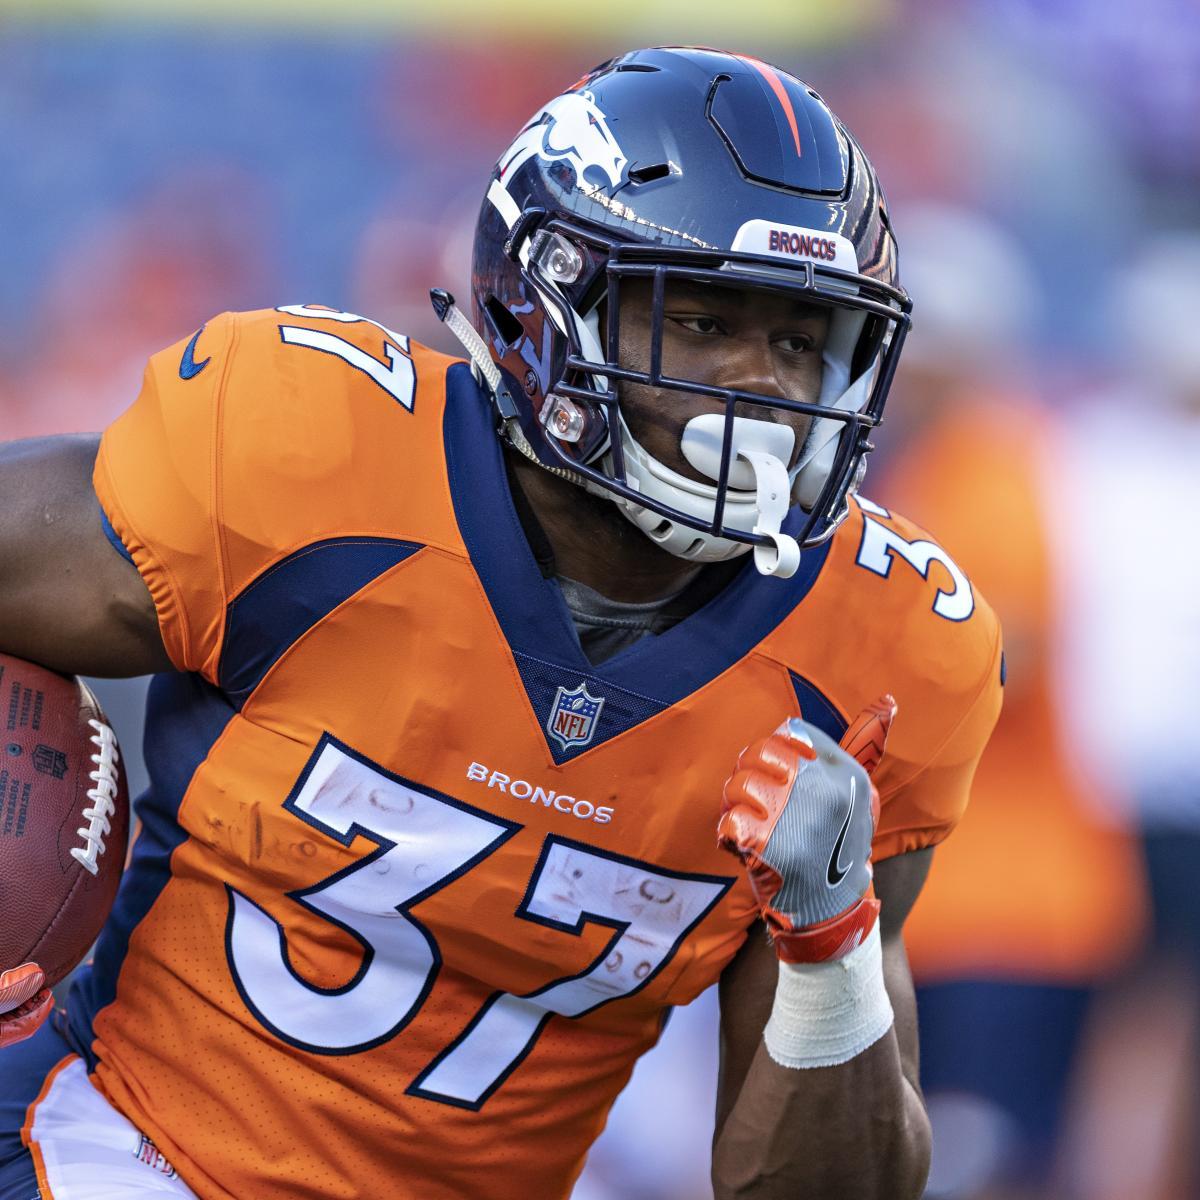 Denver Broncos Depth Chart: Royce Freeman Named Broncos' Starting RB Over Devontae